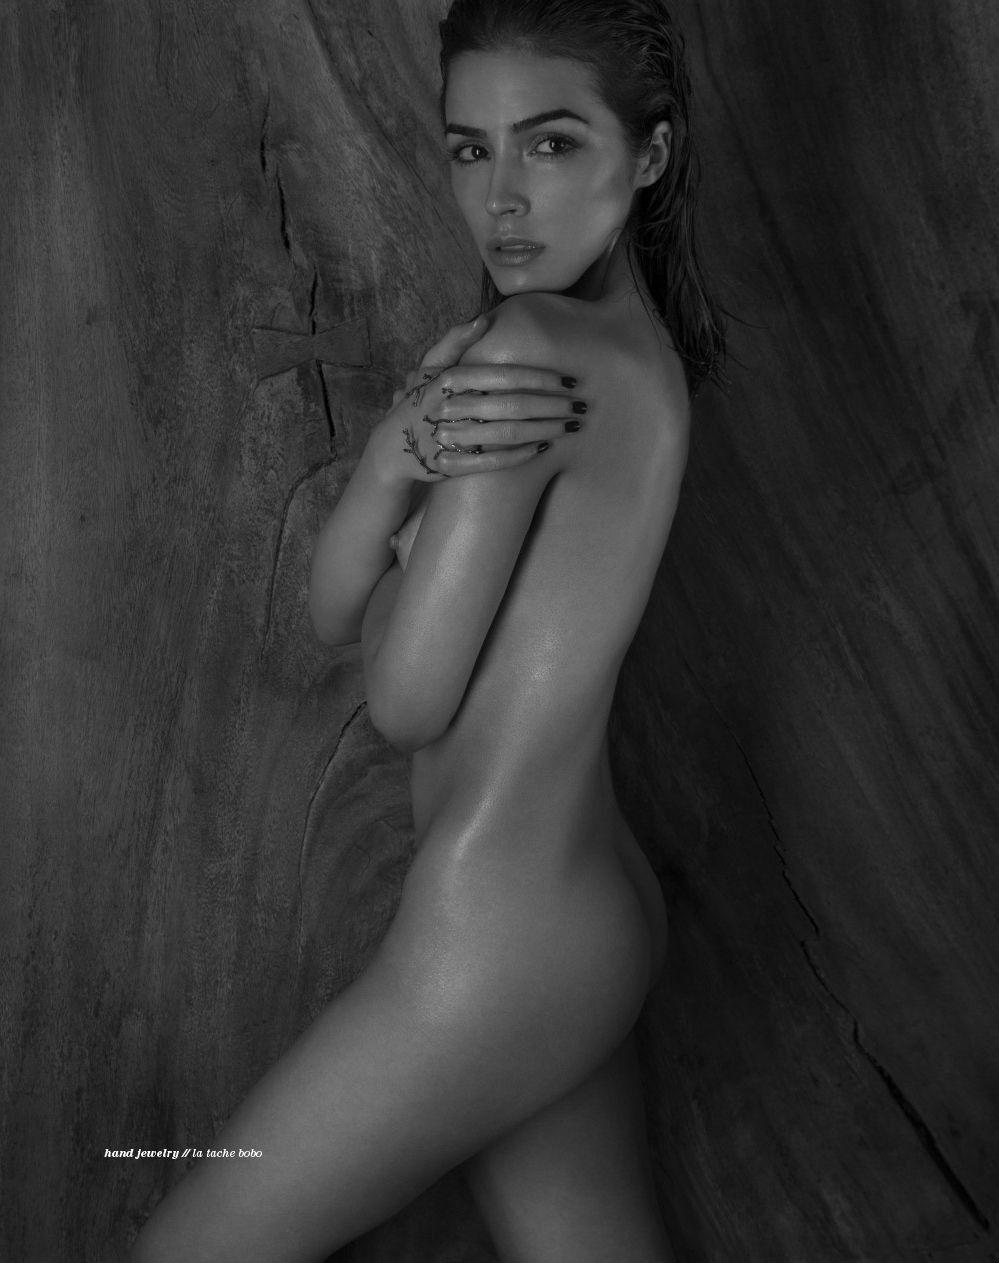 ICloud Isabel Smith nude photos 2019